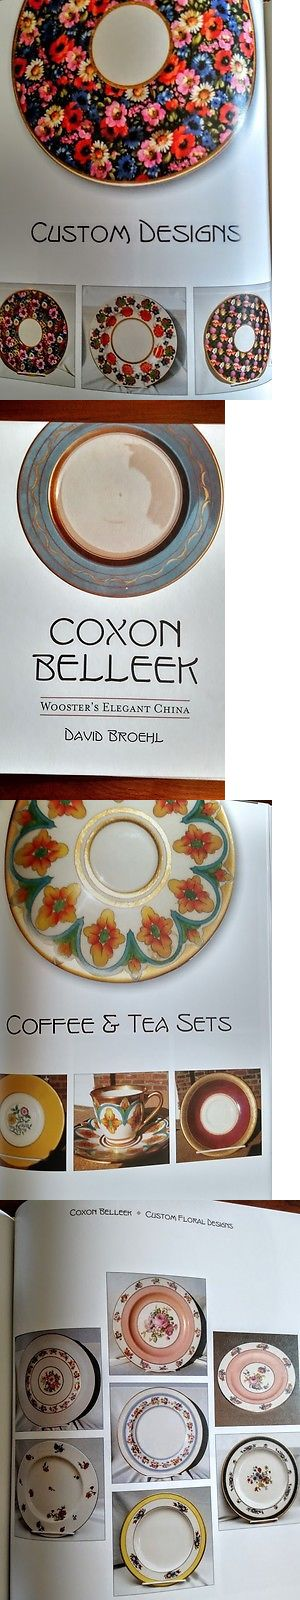 Price guide Coxon Belleek China History Photos